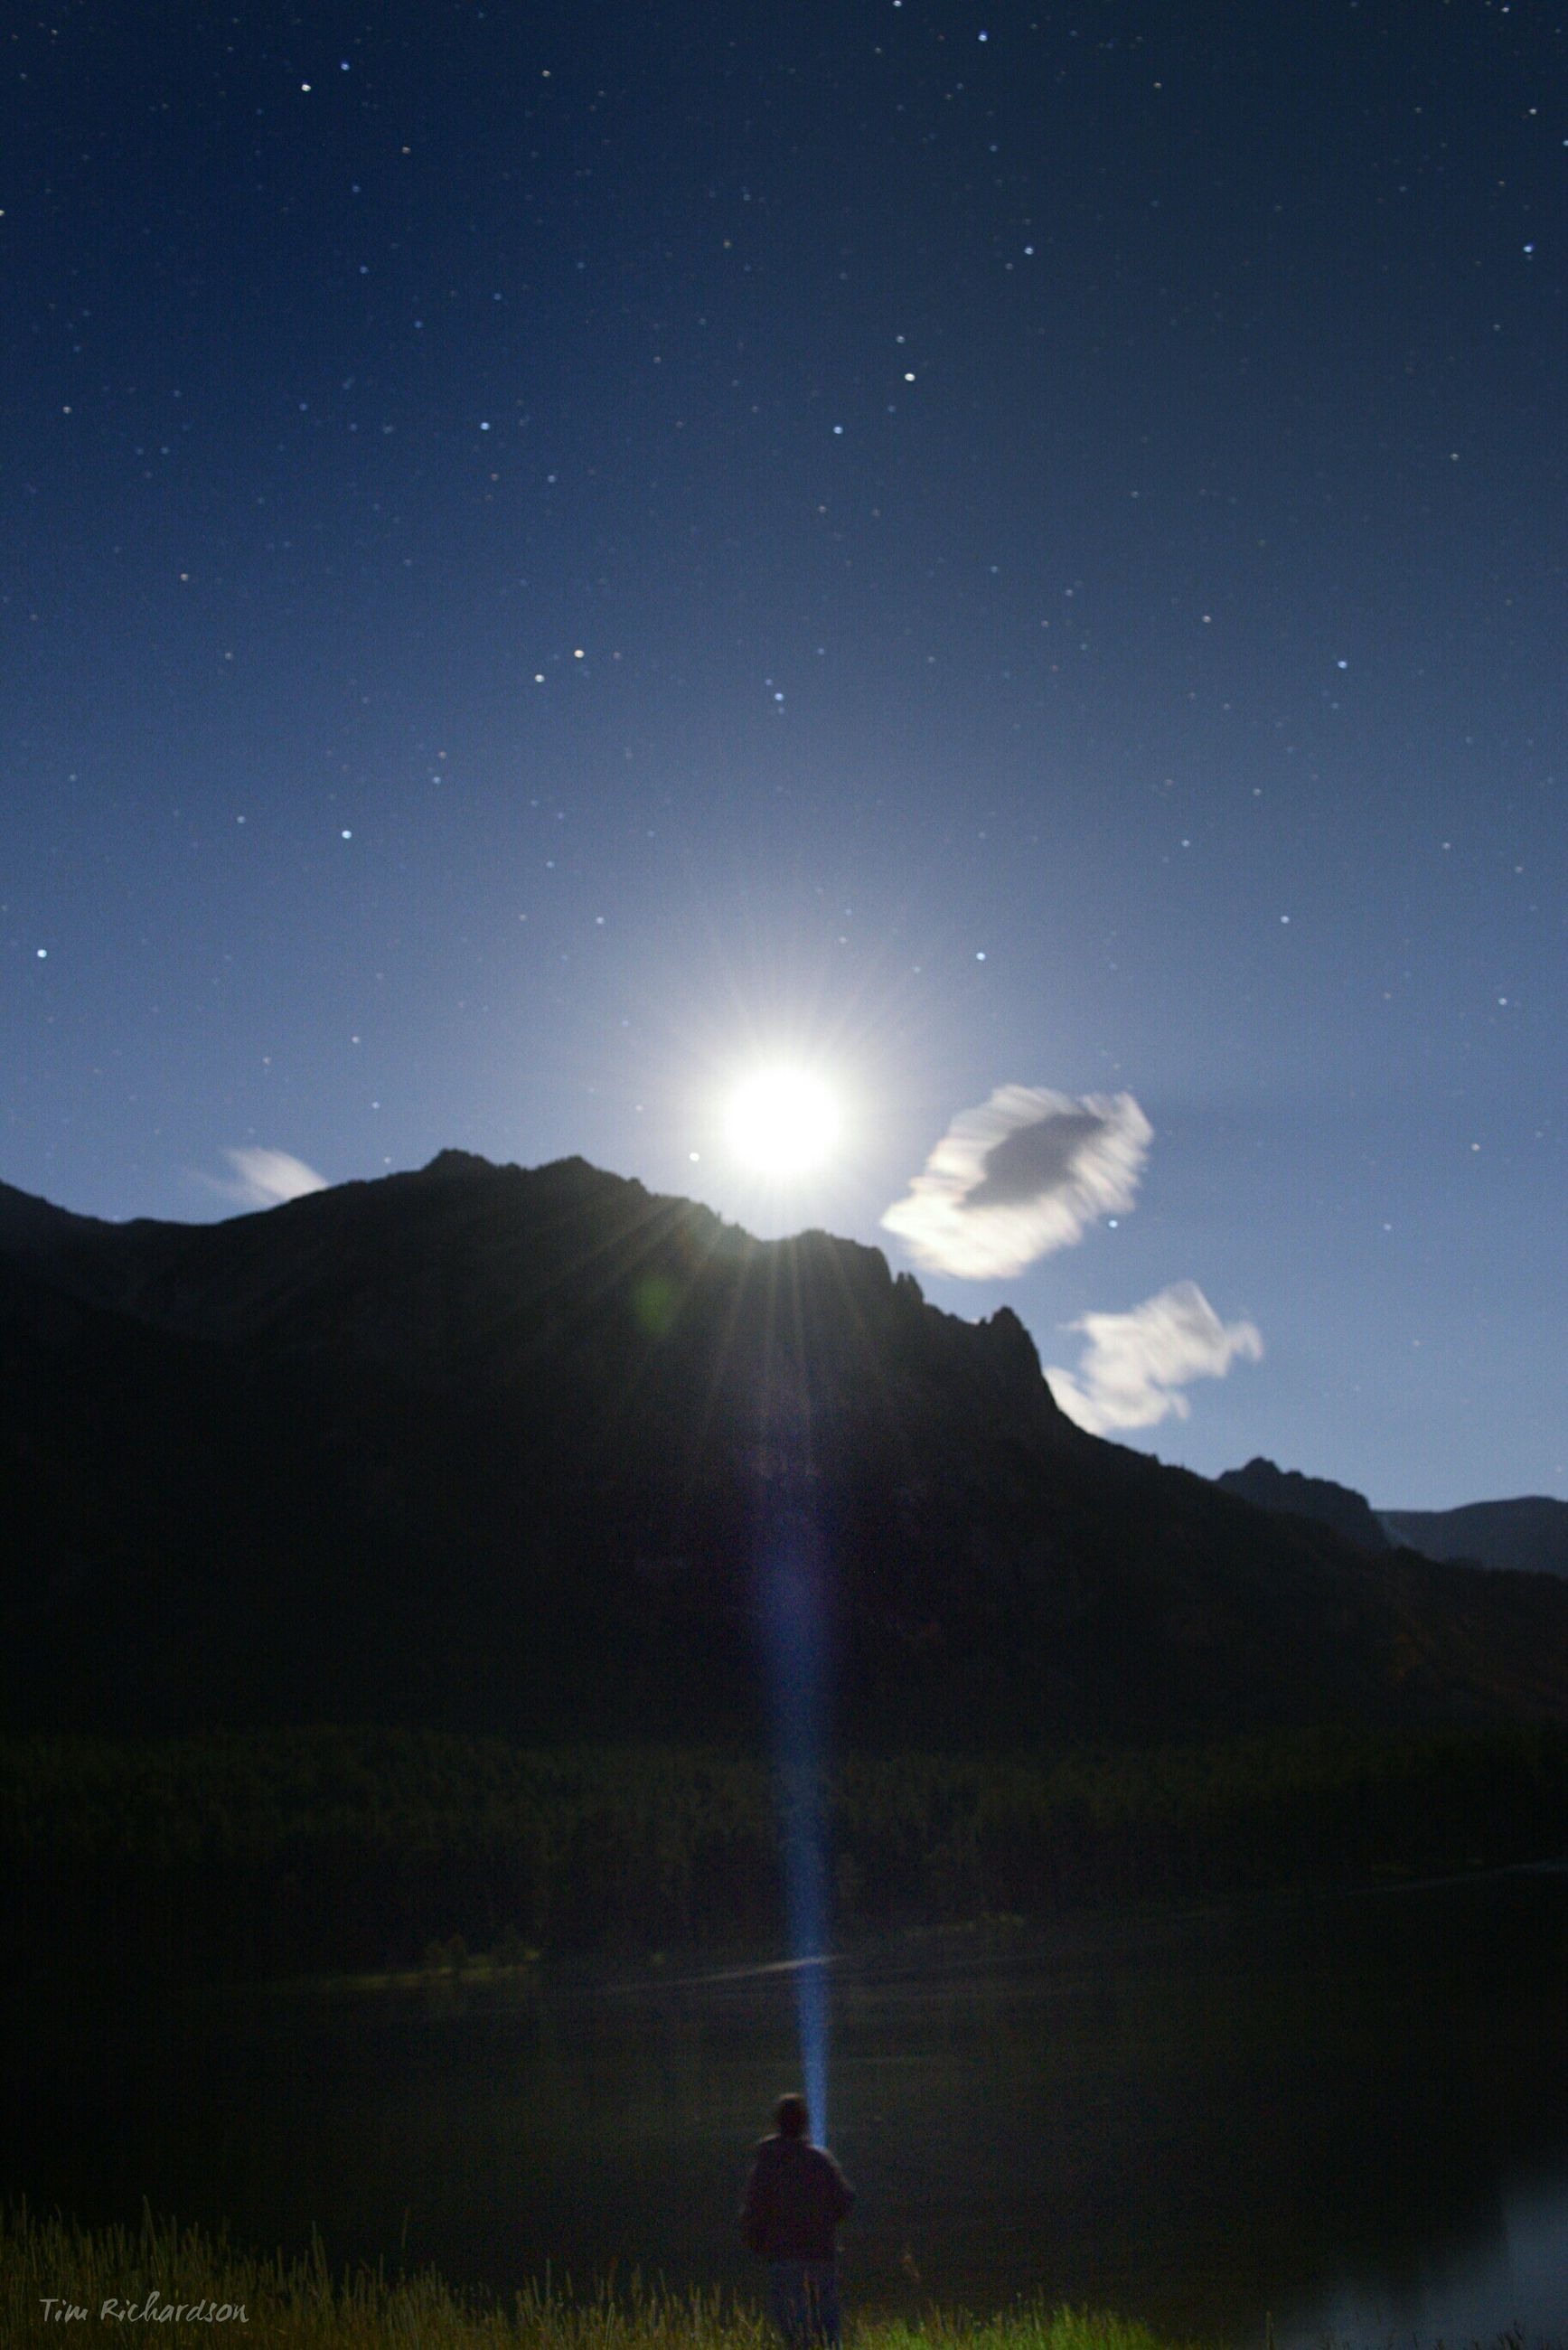 tranquil scene, scenics, tranquility, beauty in nature, mountain, sky, silhouette, nature, sun, landscape, idyllic, mountain range, night, majestic, astronomy, lens flare, moon, non-urban scene, sunlight, star field